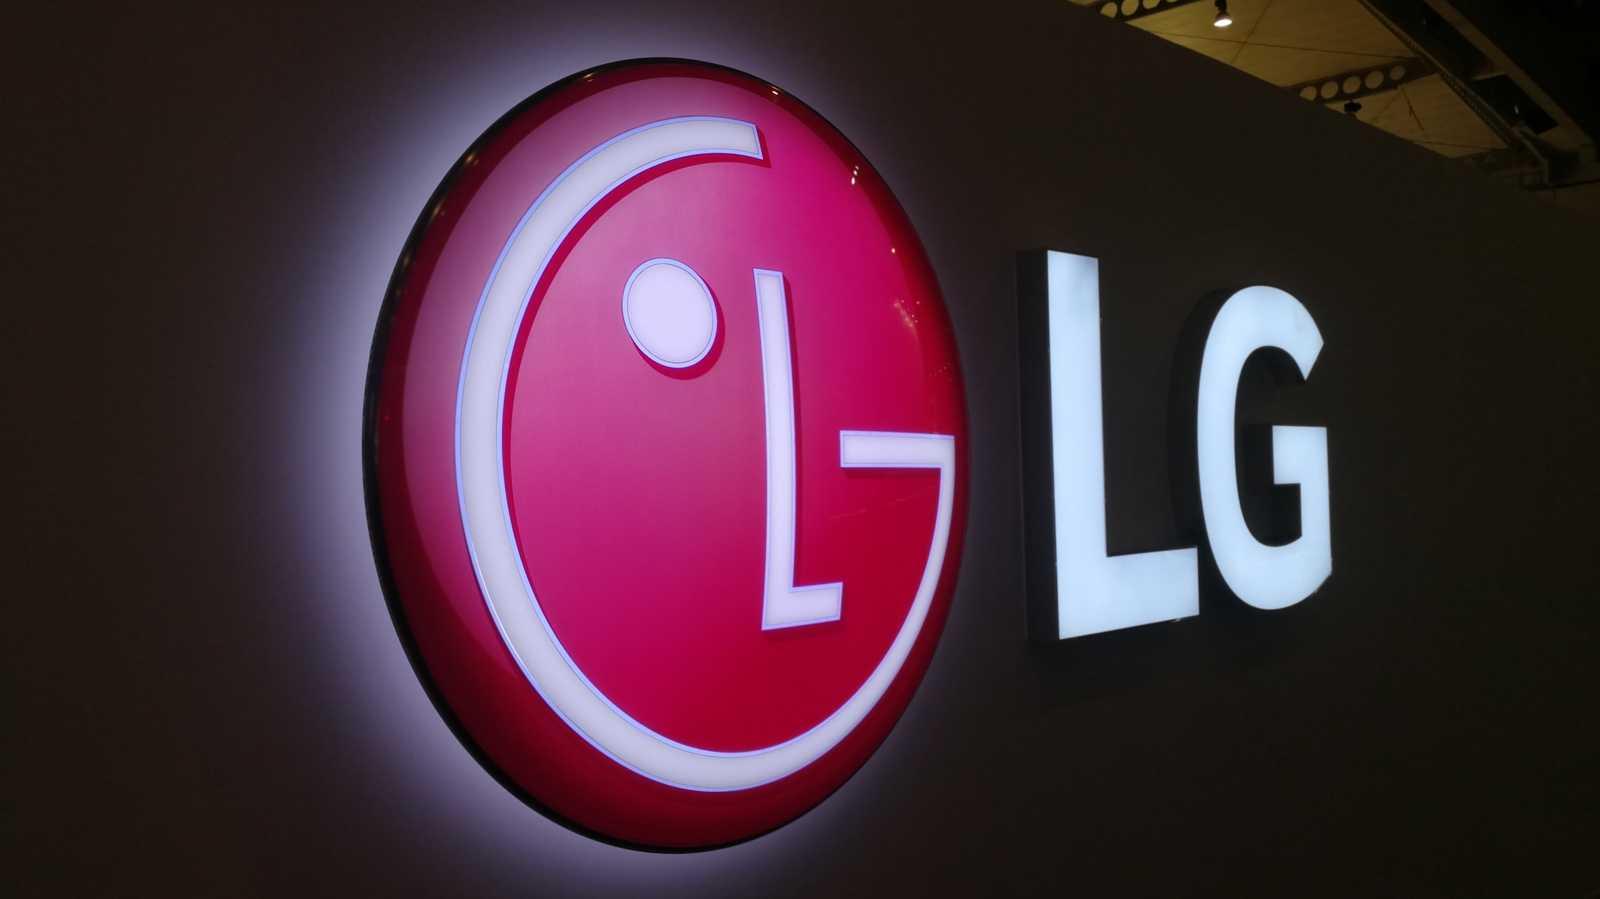 LG verharrt beim Smartphone-Geschäft in der Verlustzone